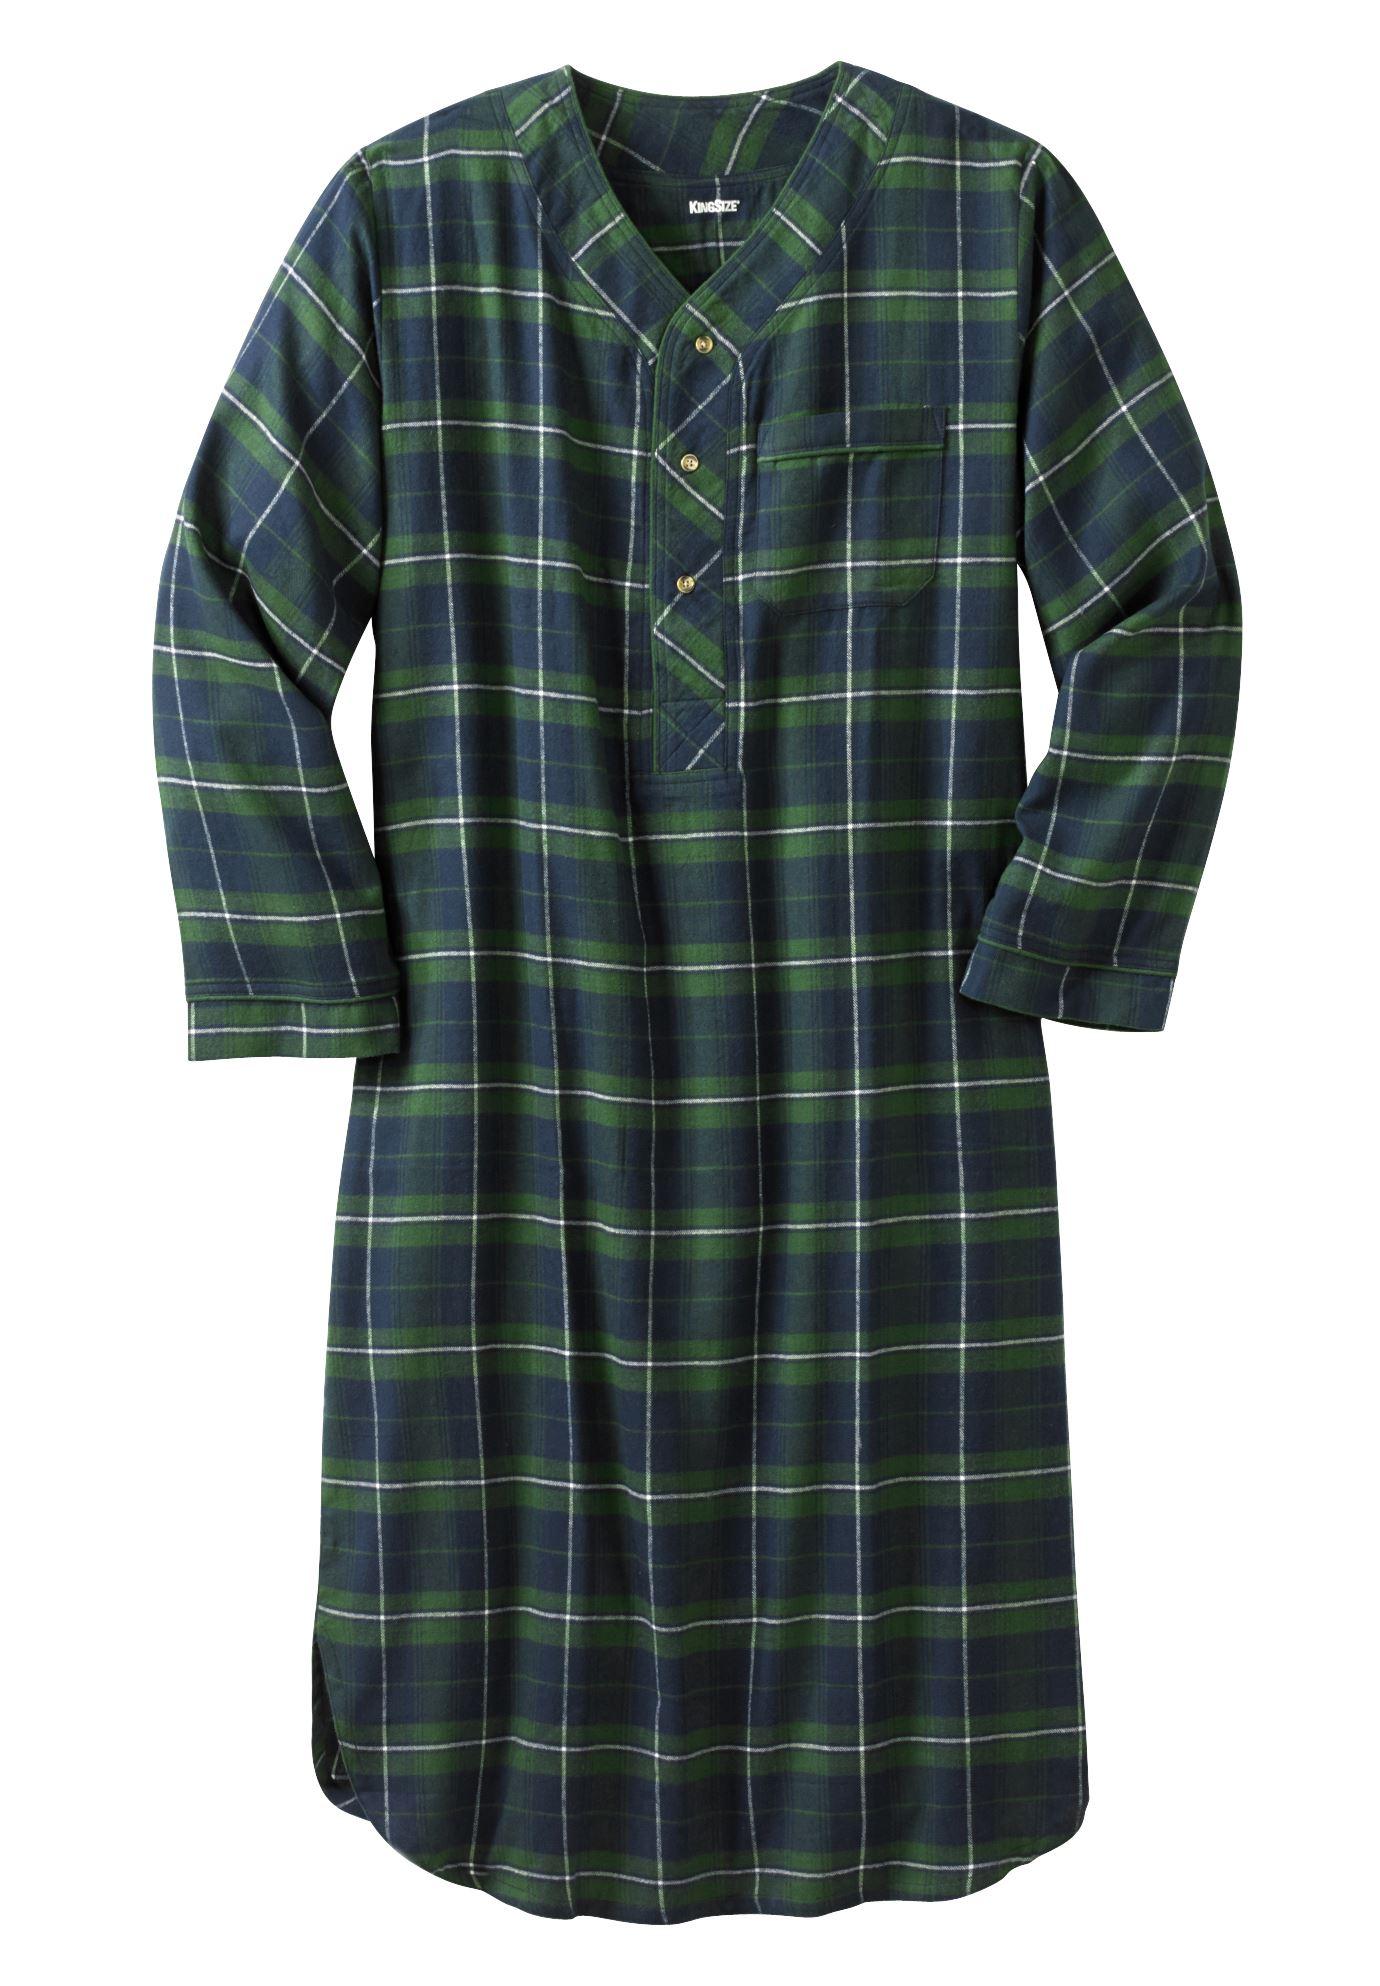 Plaid Flannel Nightshirt | Plus Size Robes & Sleepwear | King Size